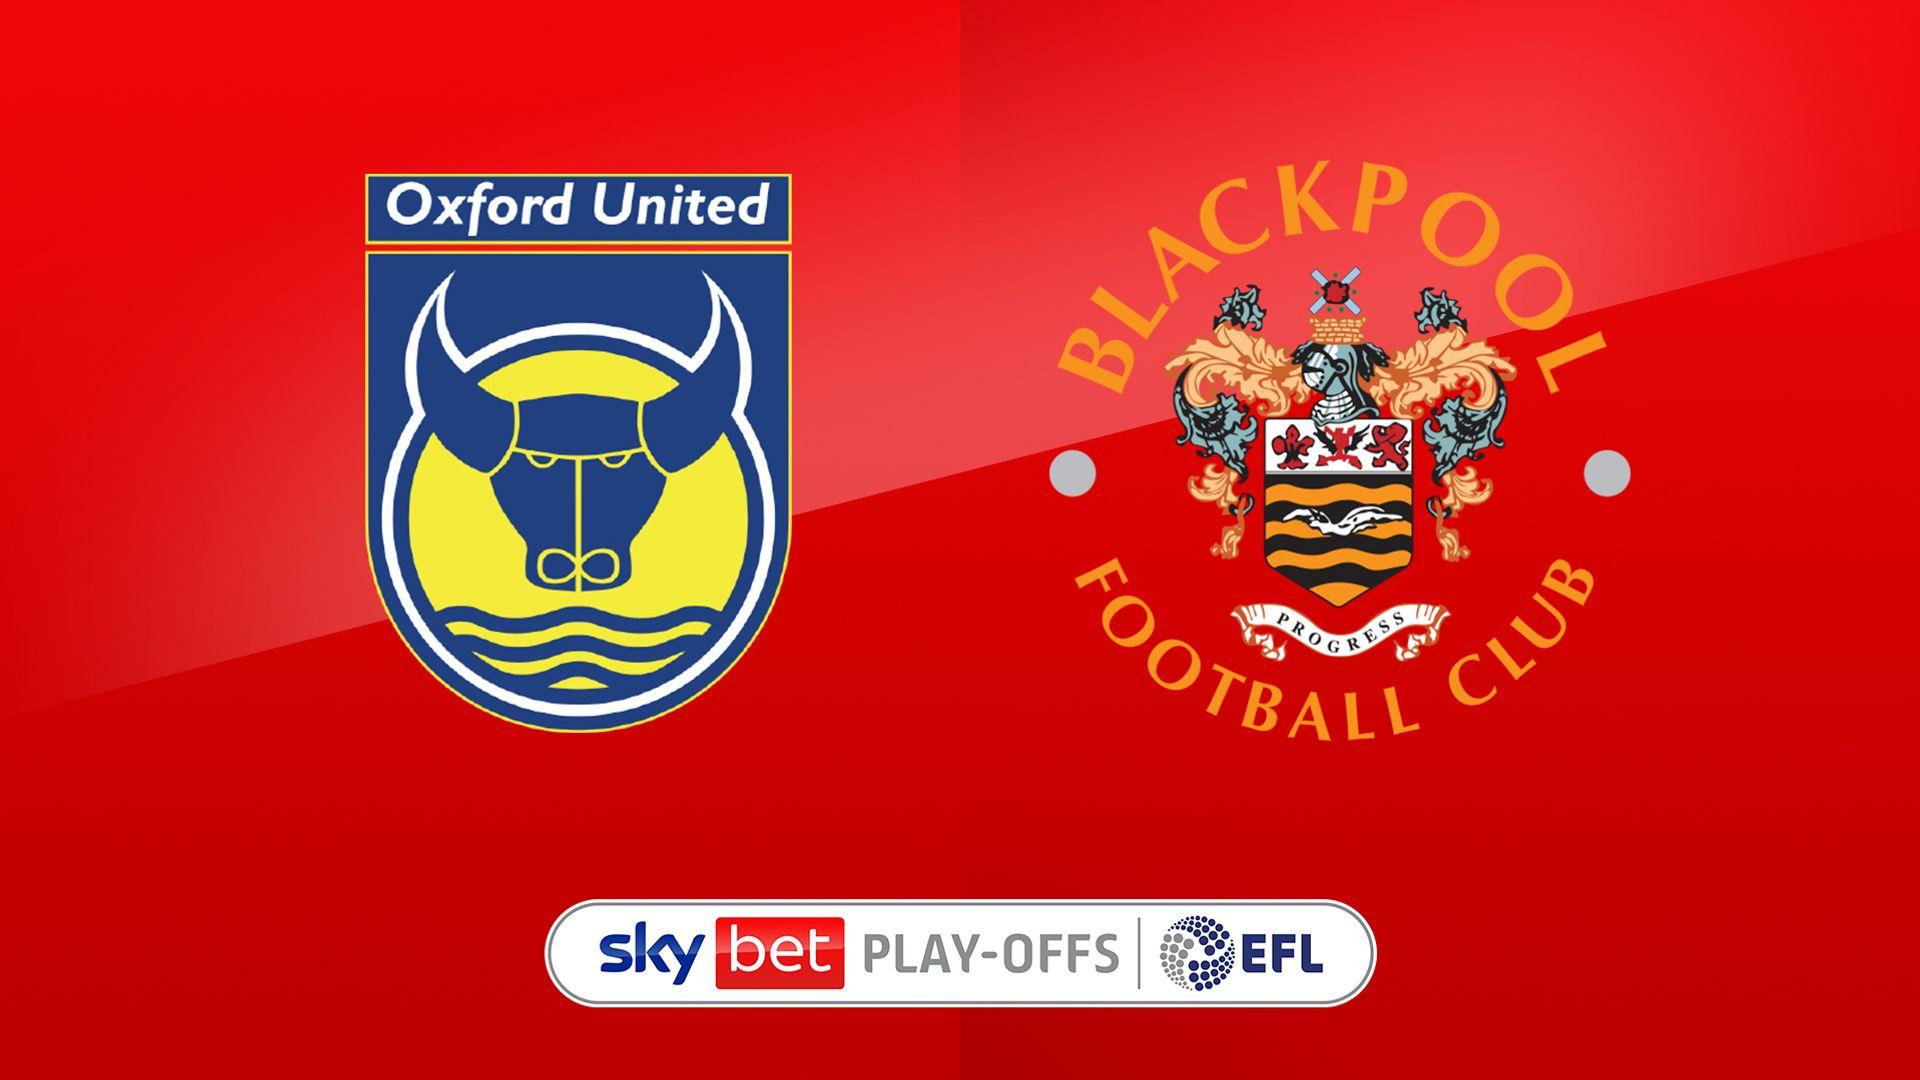 Live on Sky: Oxford vs Blackpool